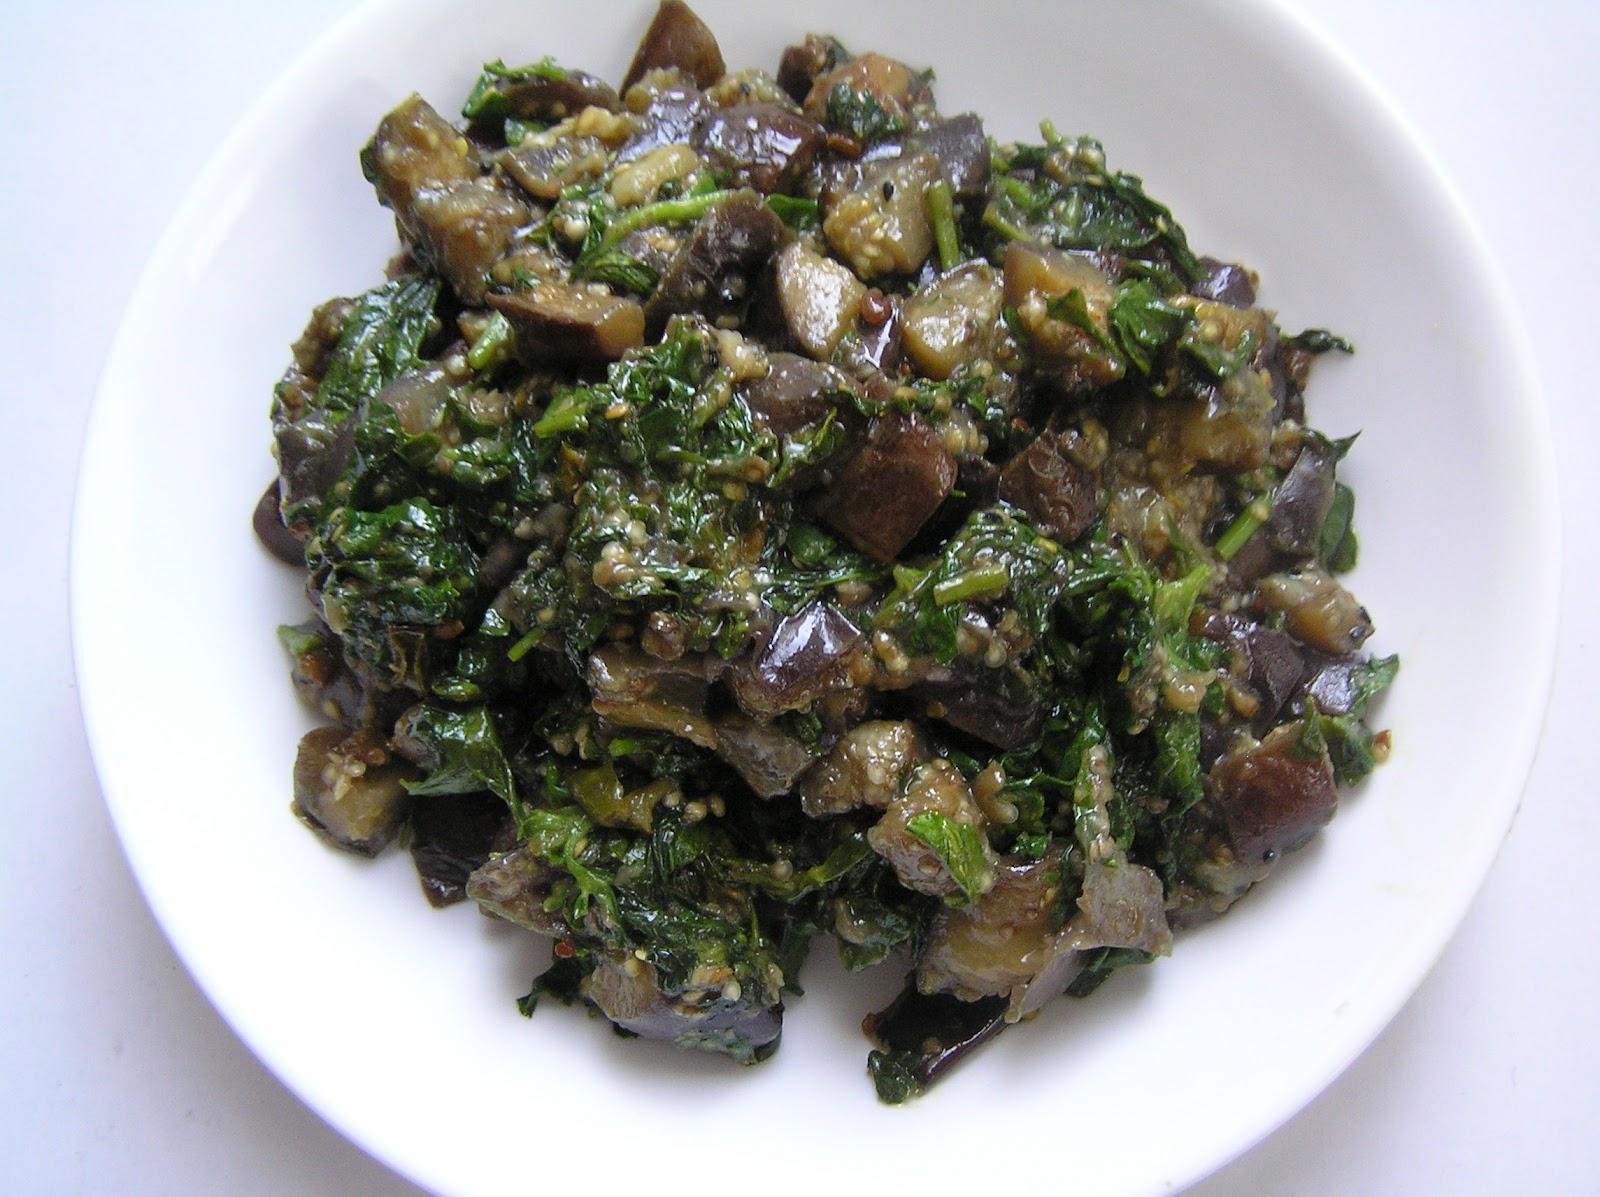 The Melting Pot: Methi Begun / Fenugreek Leaves with Eggplant